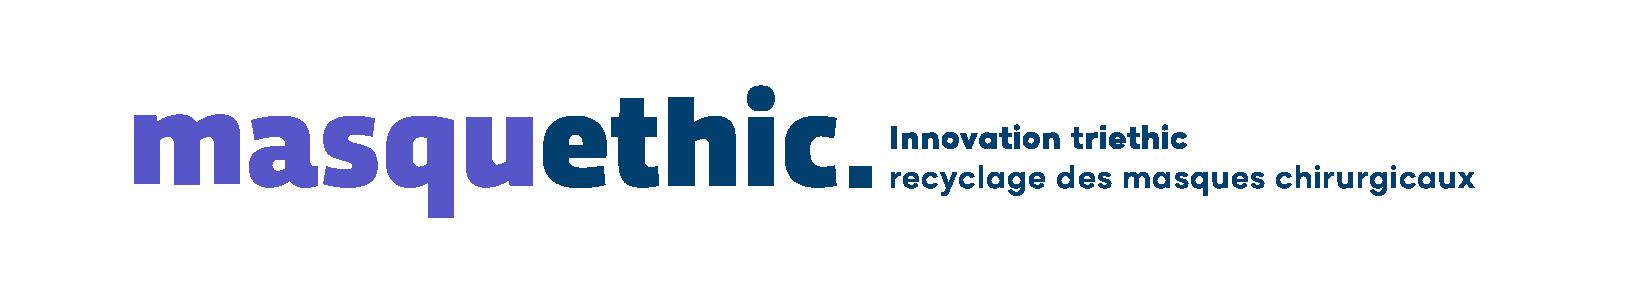 logo masquethic